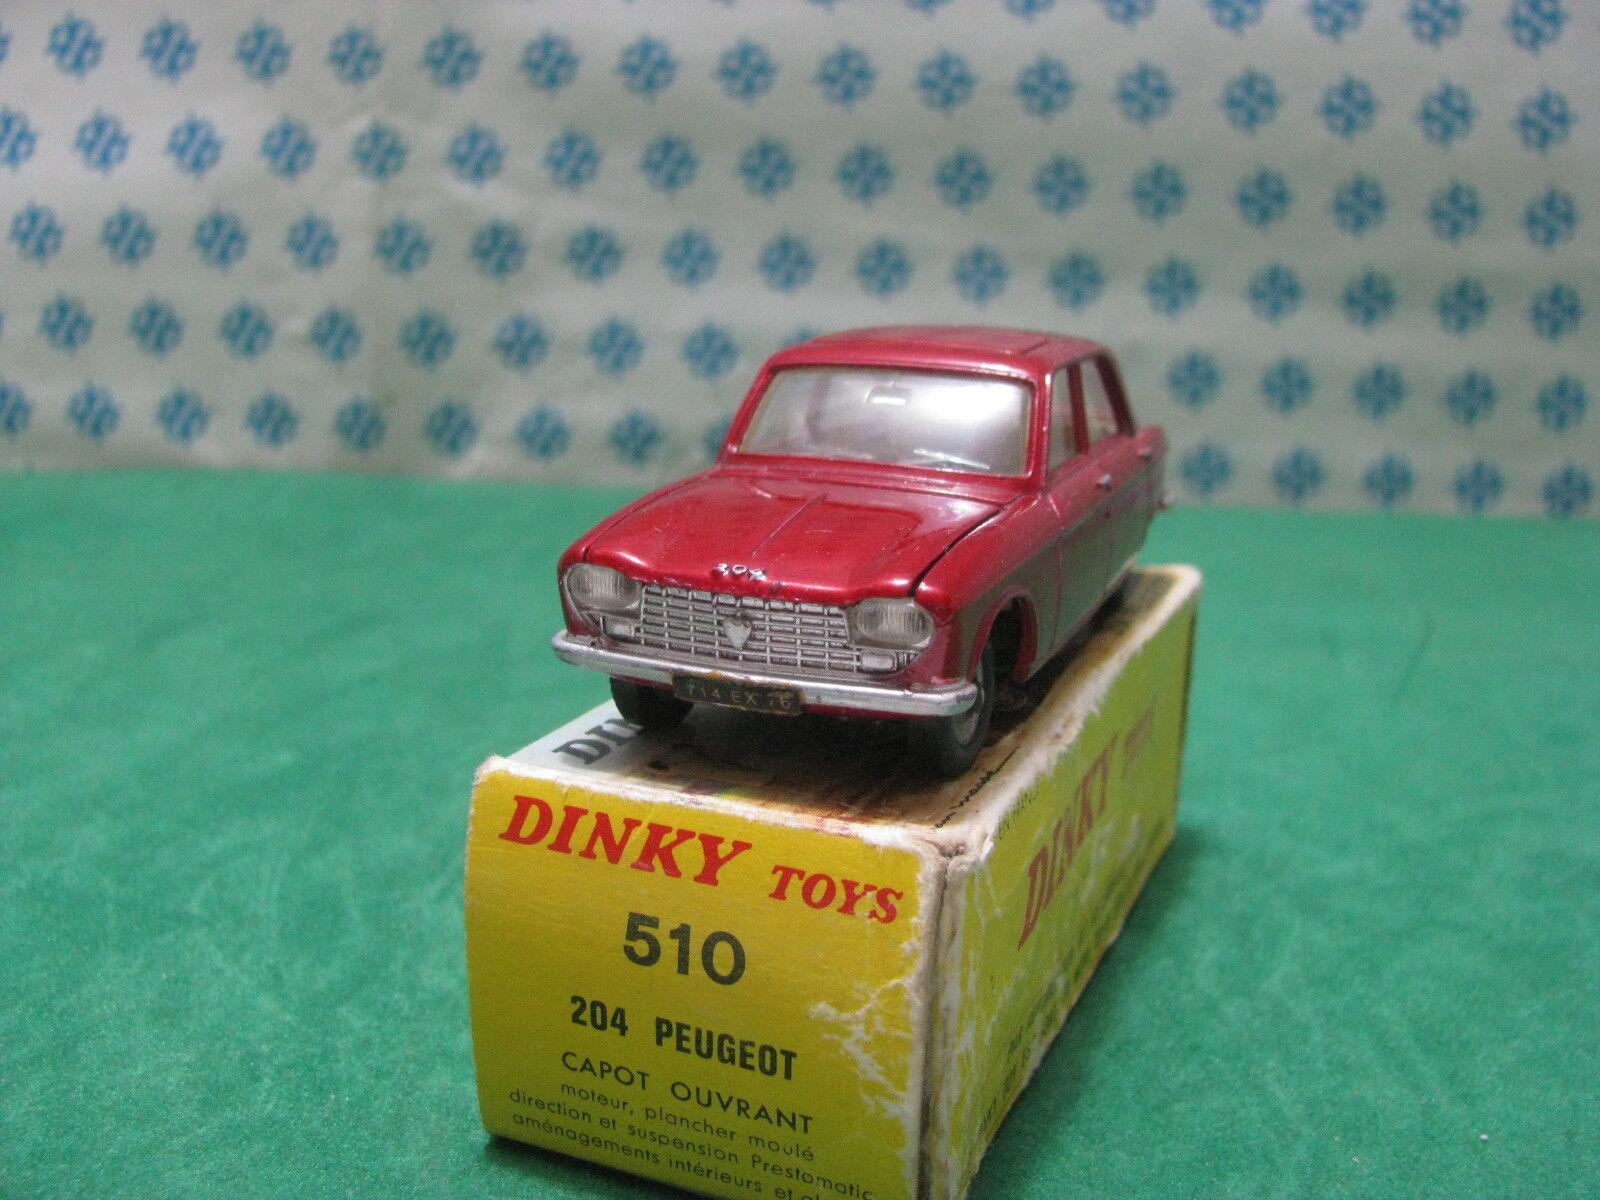 Vintage - Peugeot 204 - 1 43 Dinky Toys 510 Mint Box